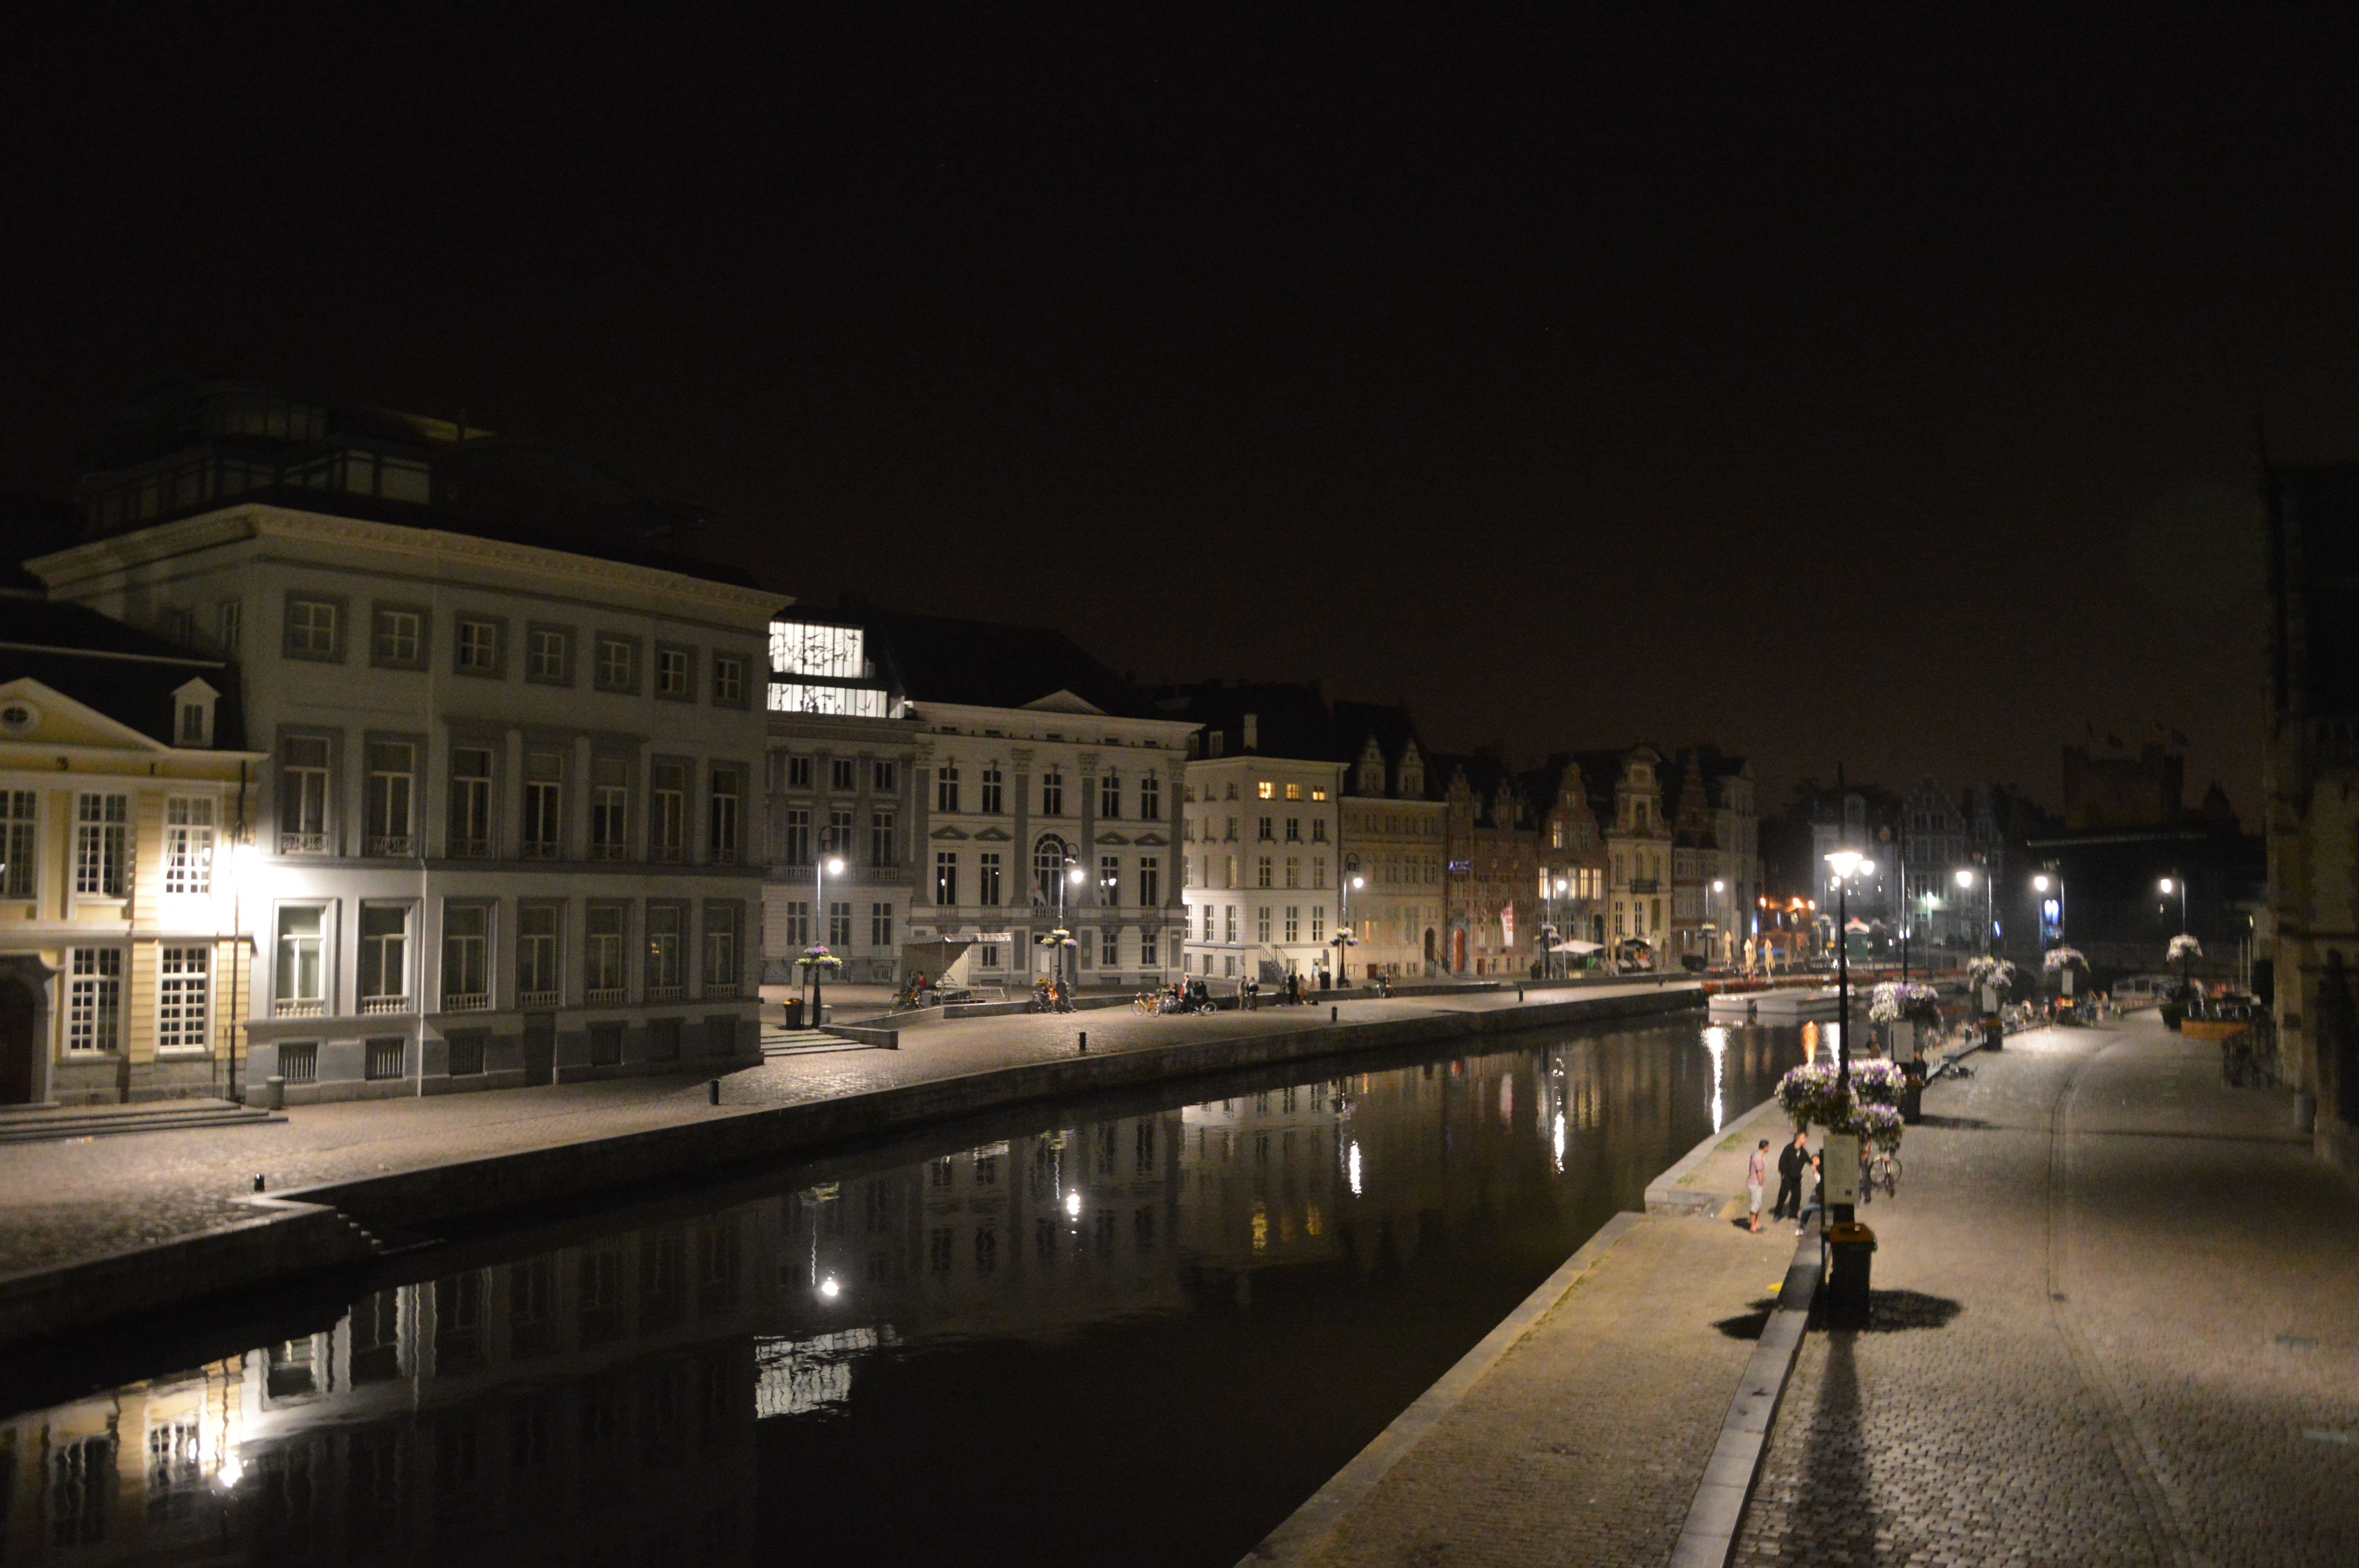 Gent 2013 by Astrid Hilpert